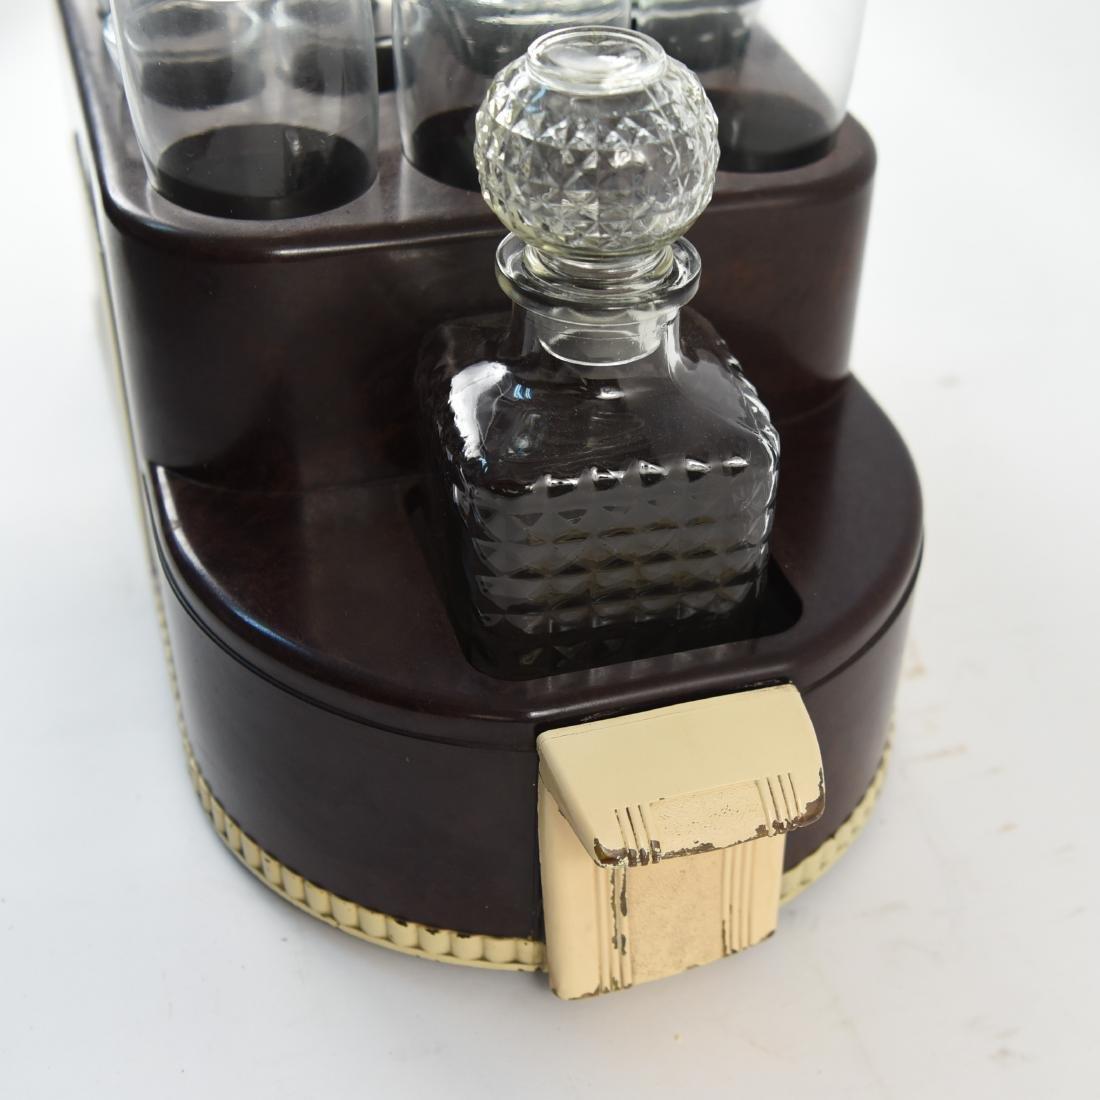 VINTAGE ART DECO LIQUOR DRINK CADDY - 6